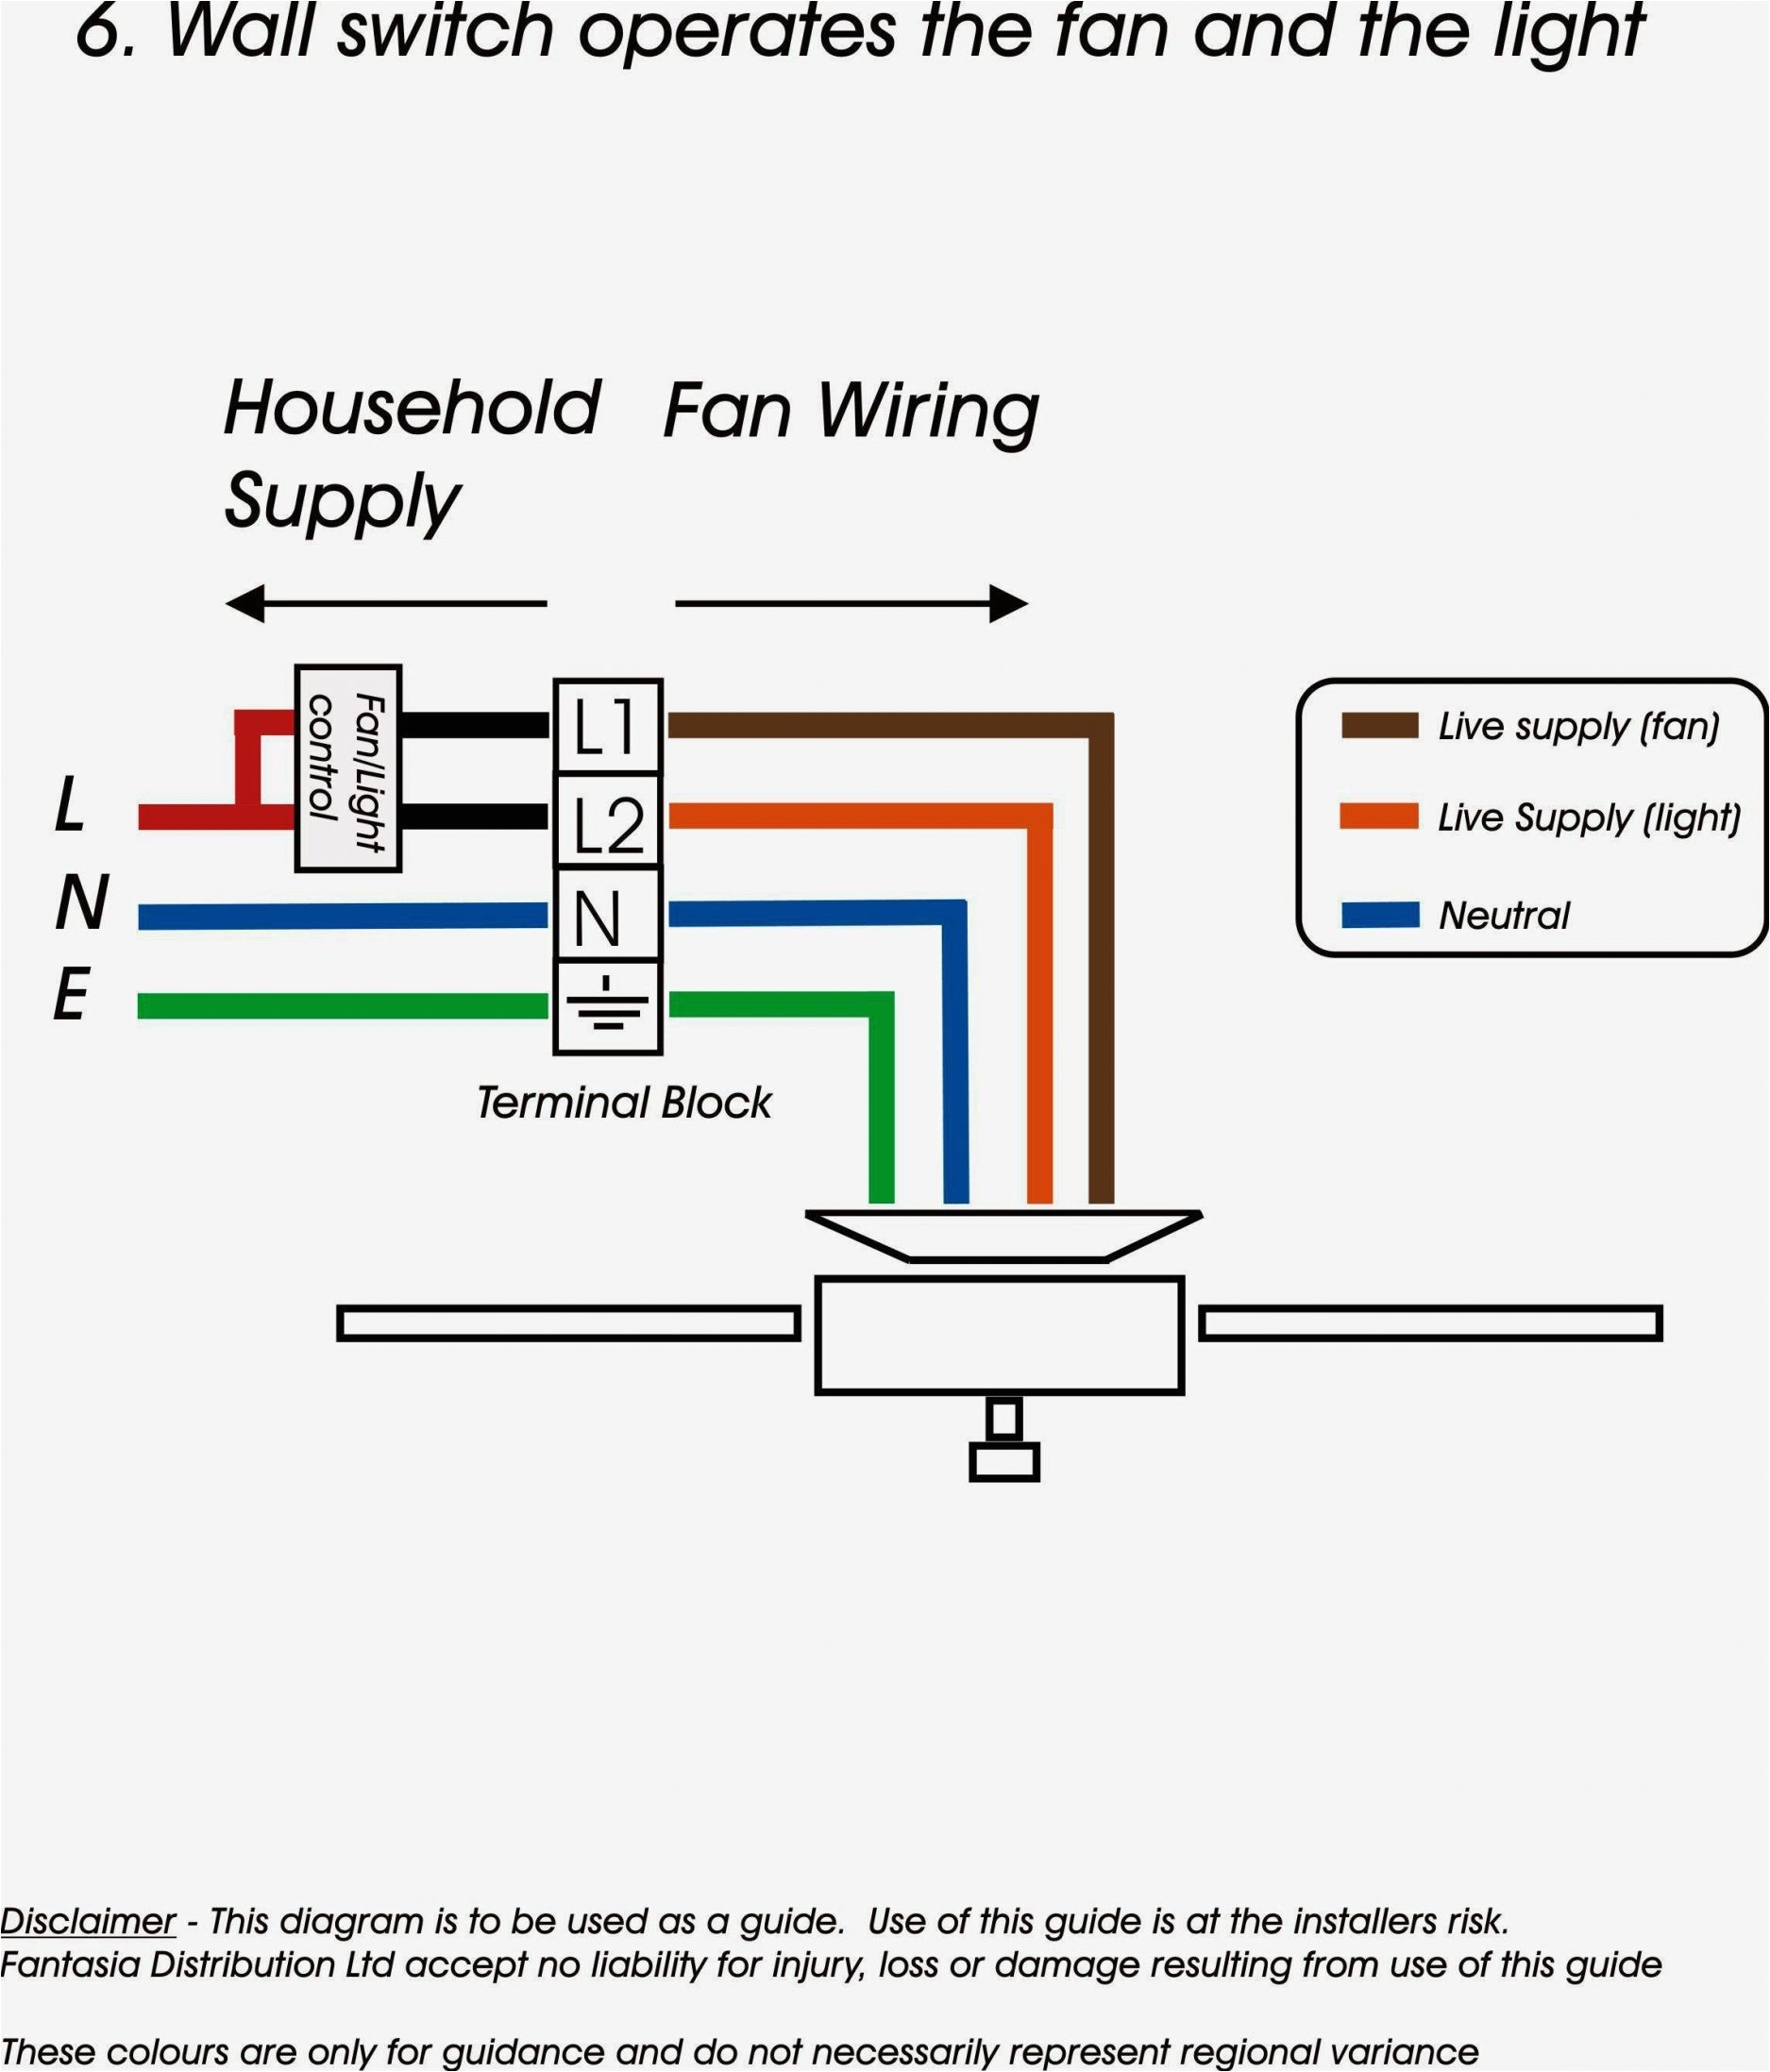 fulham wh5 120 l wiring diagram ballast wiring diagram new slimline diagrams of fulham workhorse 2 rh natebird me 2 lamp ballast wiring diagram 2 lamp ballast wiring diagram 12l jpg